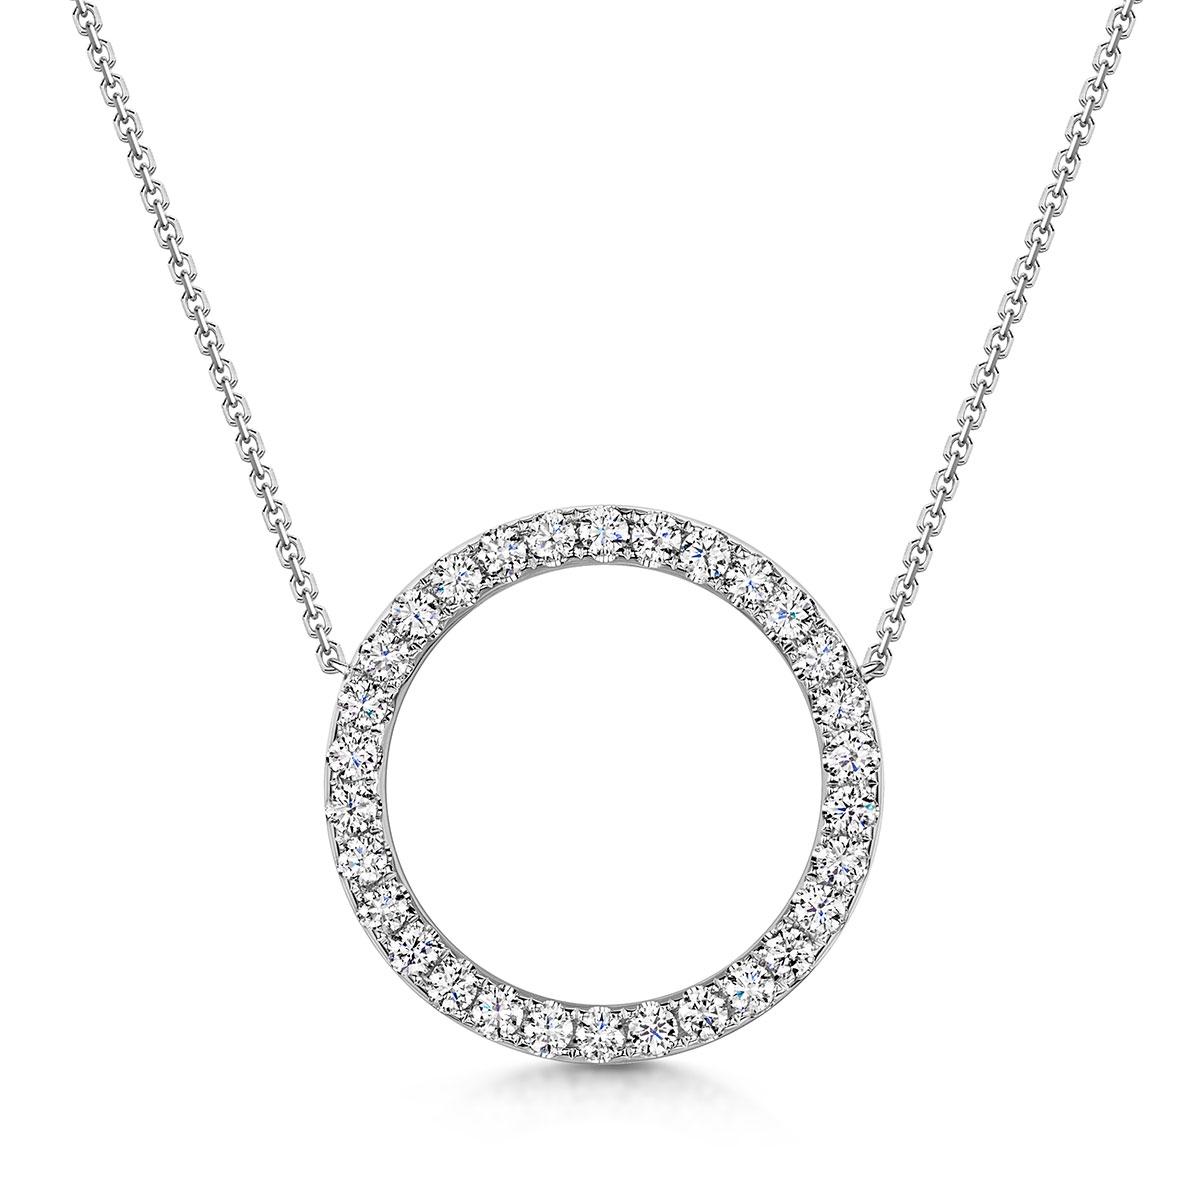 ROX Circle Diamond Necklace 1.18cts